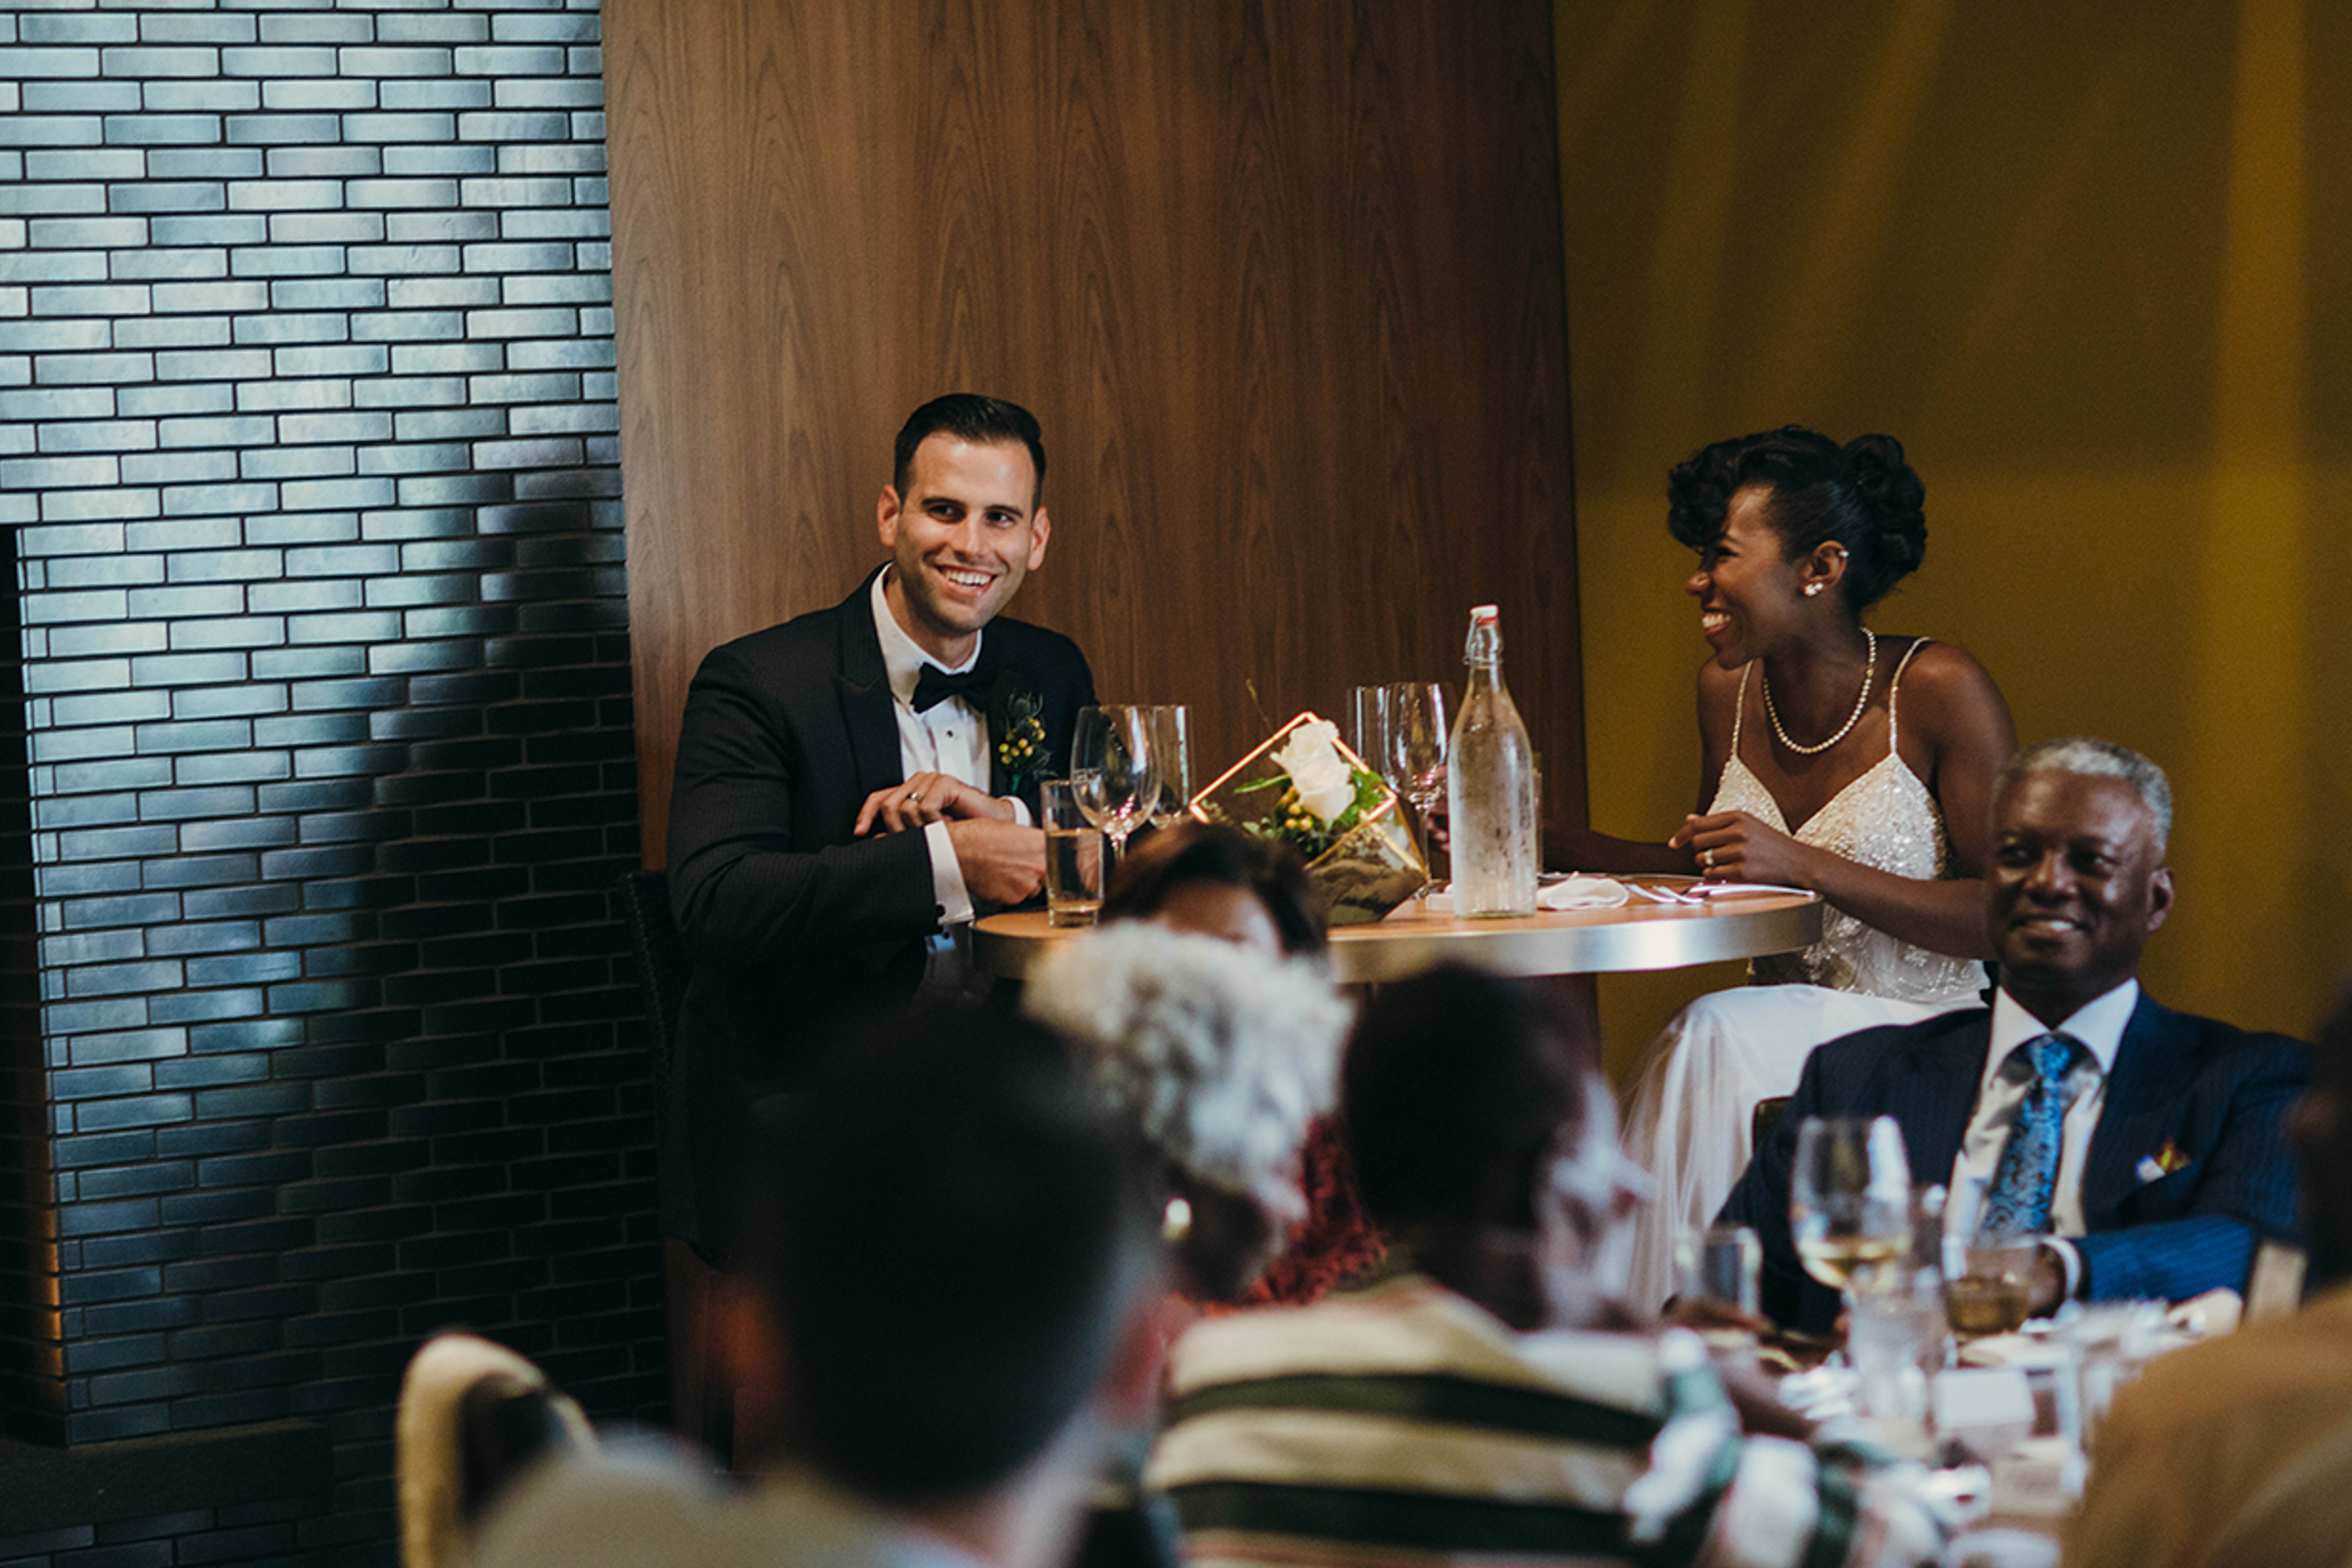 chicago.wedding.urban.intimate.zed451.lake.milton olive park-64.jpg